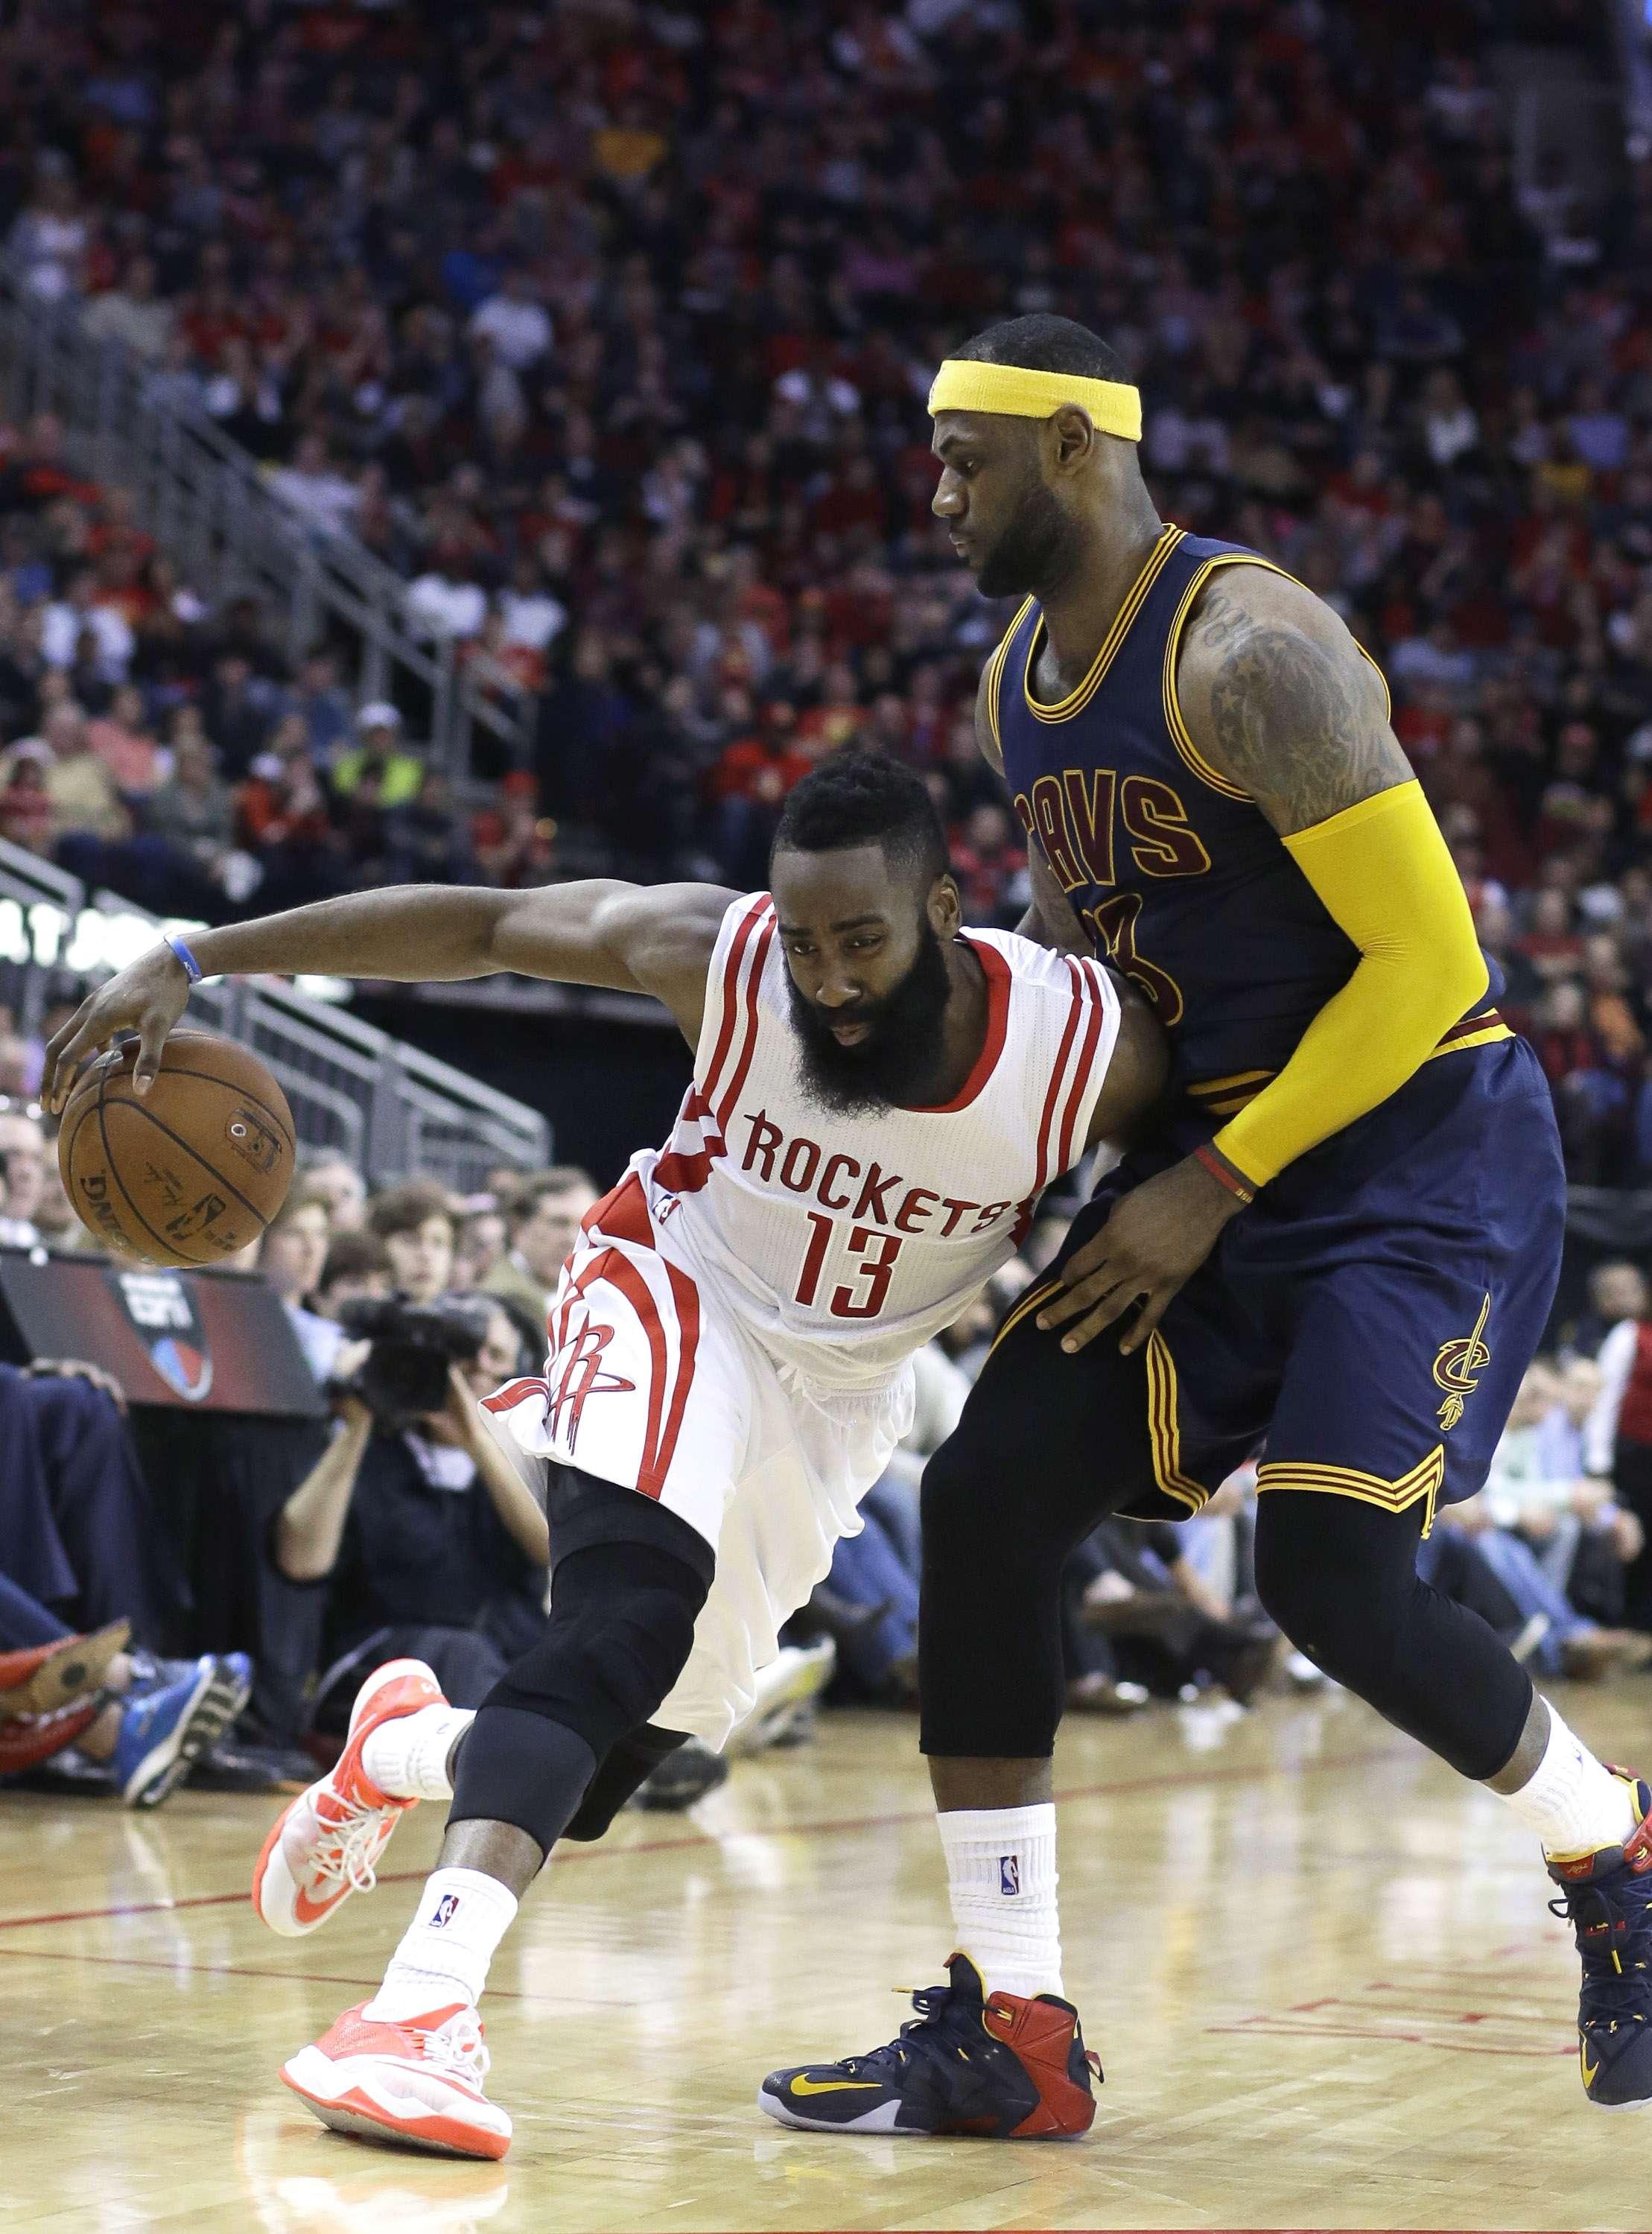 Harden y LeBron se enfrascaron en un intenso duelo. Foto: AP